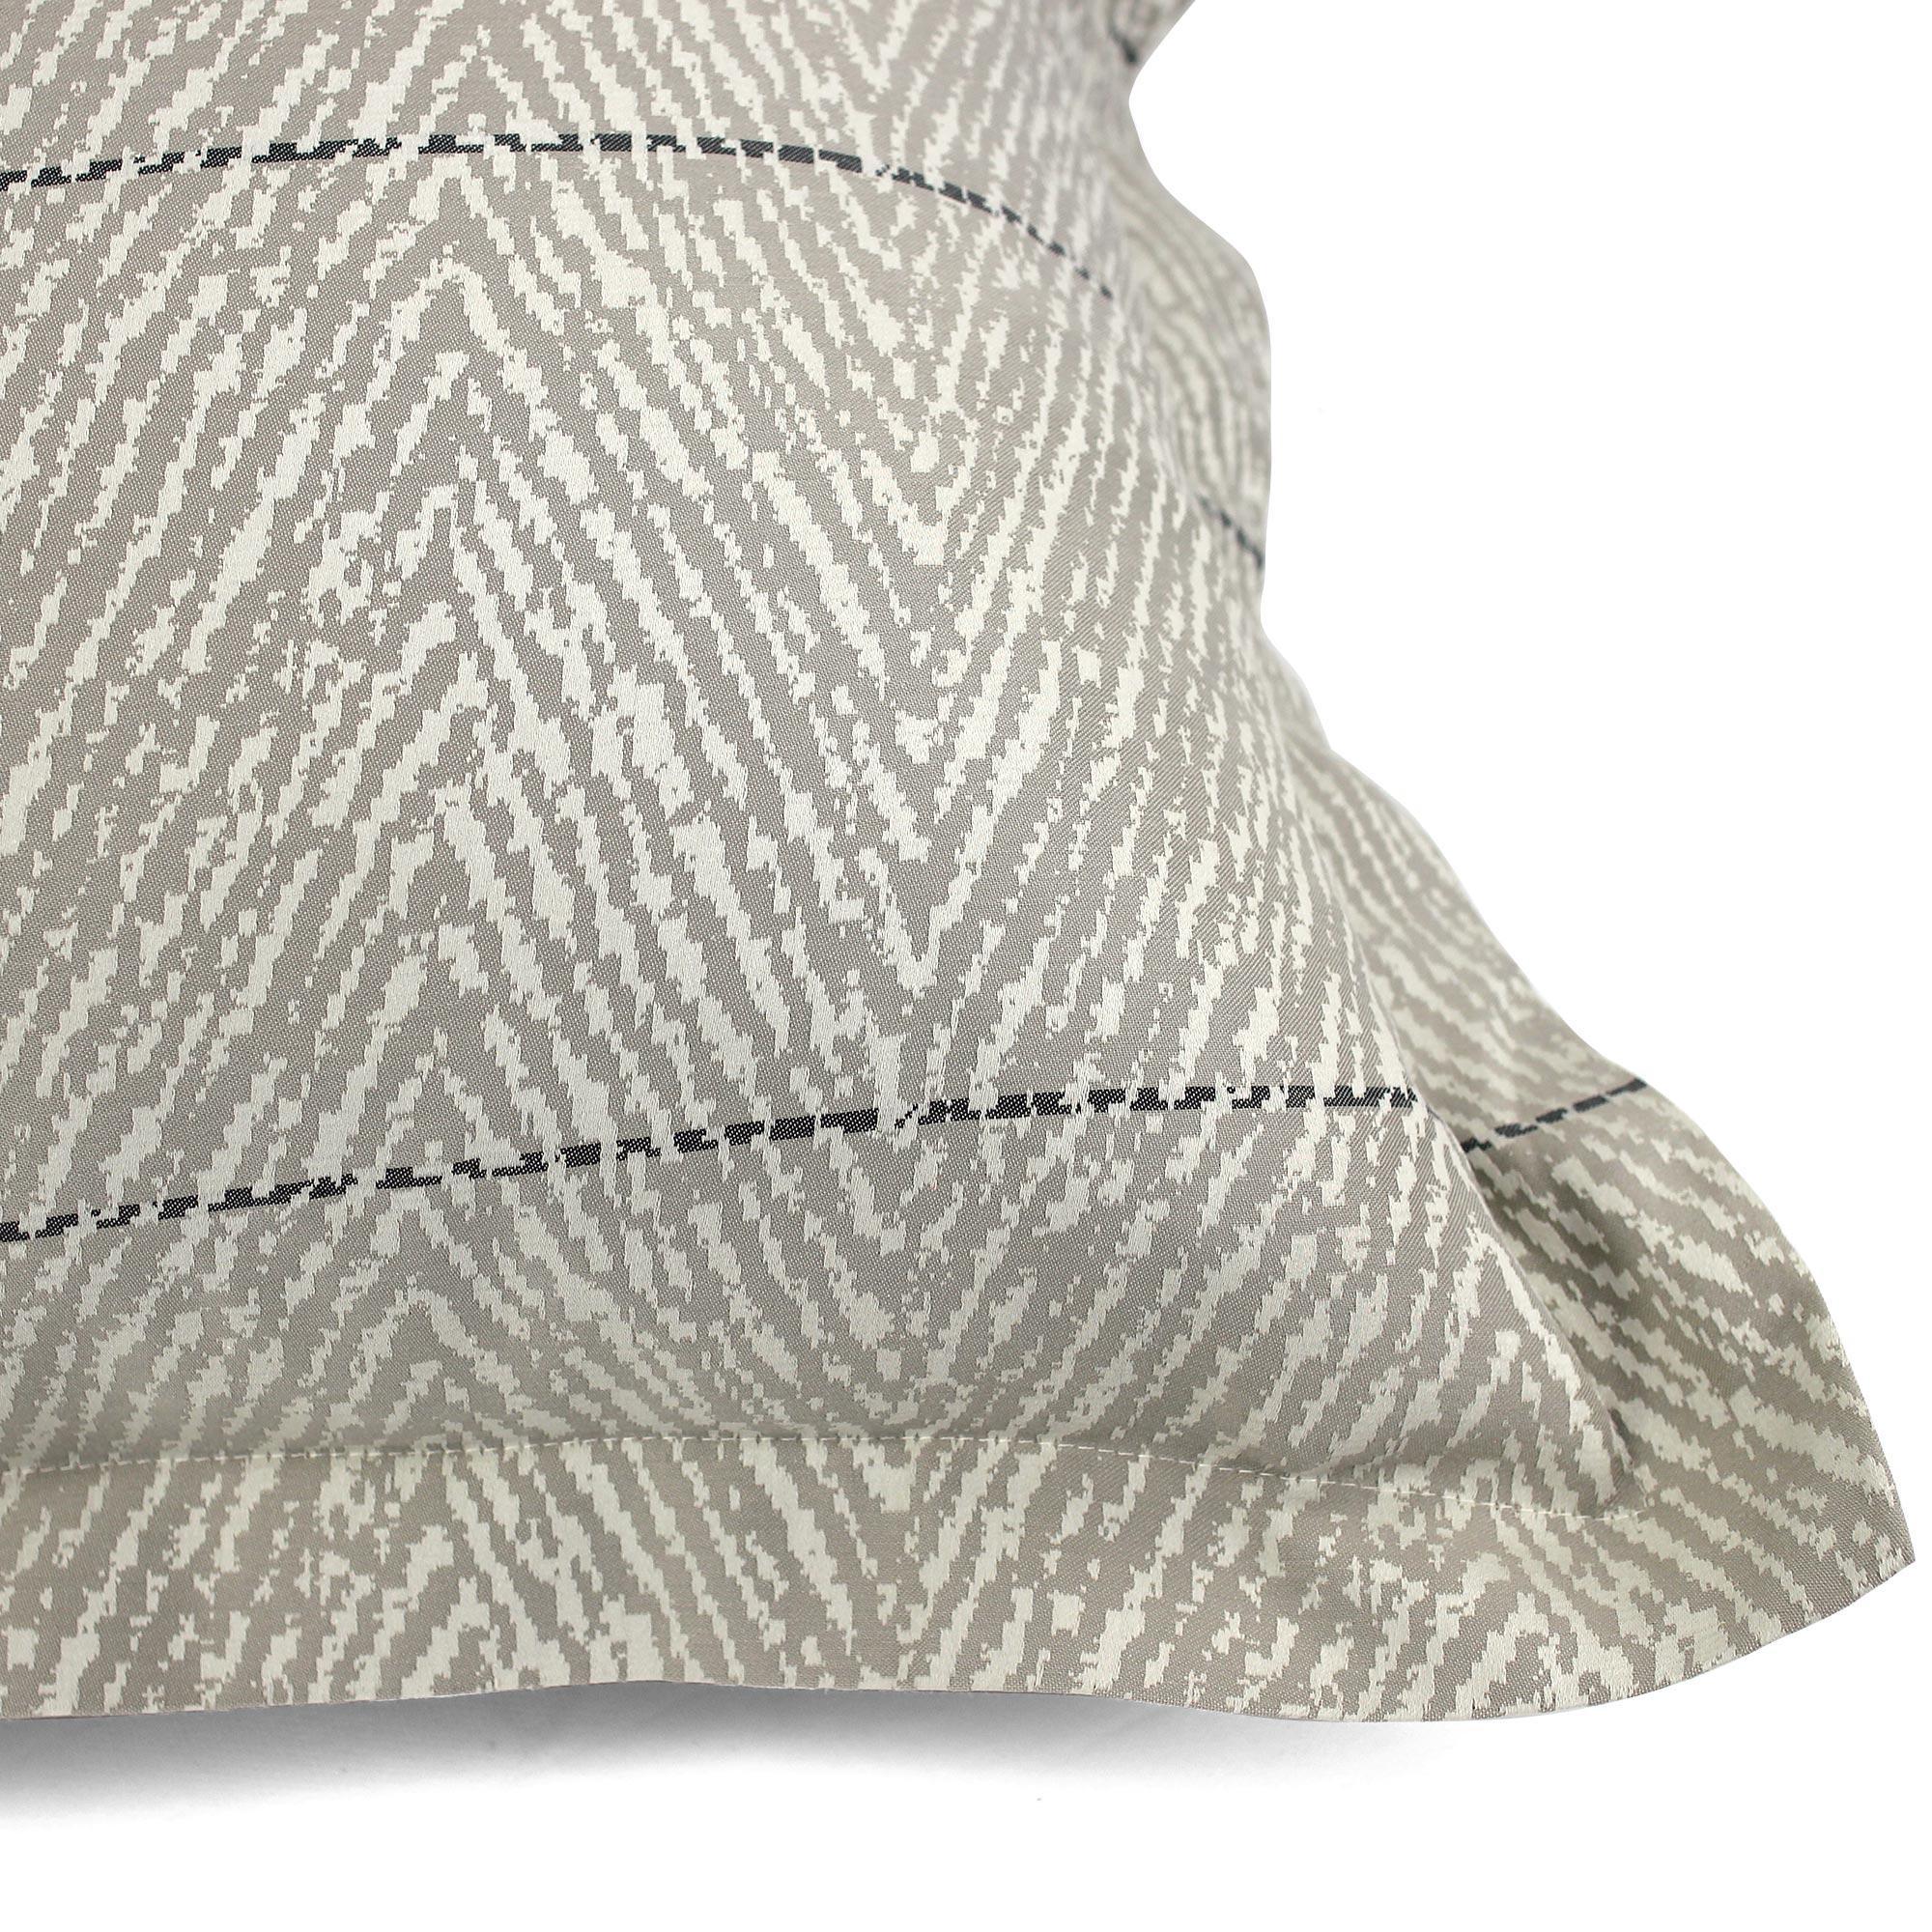 parure de lit 260x240 satin de coton odeon marron clair ebay. Black Bedroom Furniture Sets. Home Design Ideas